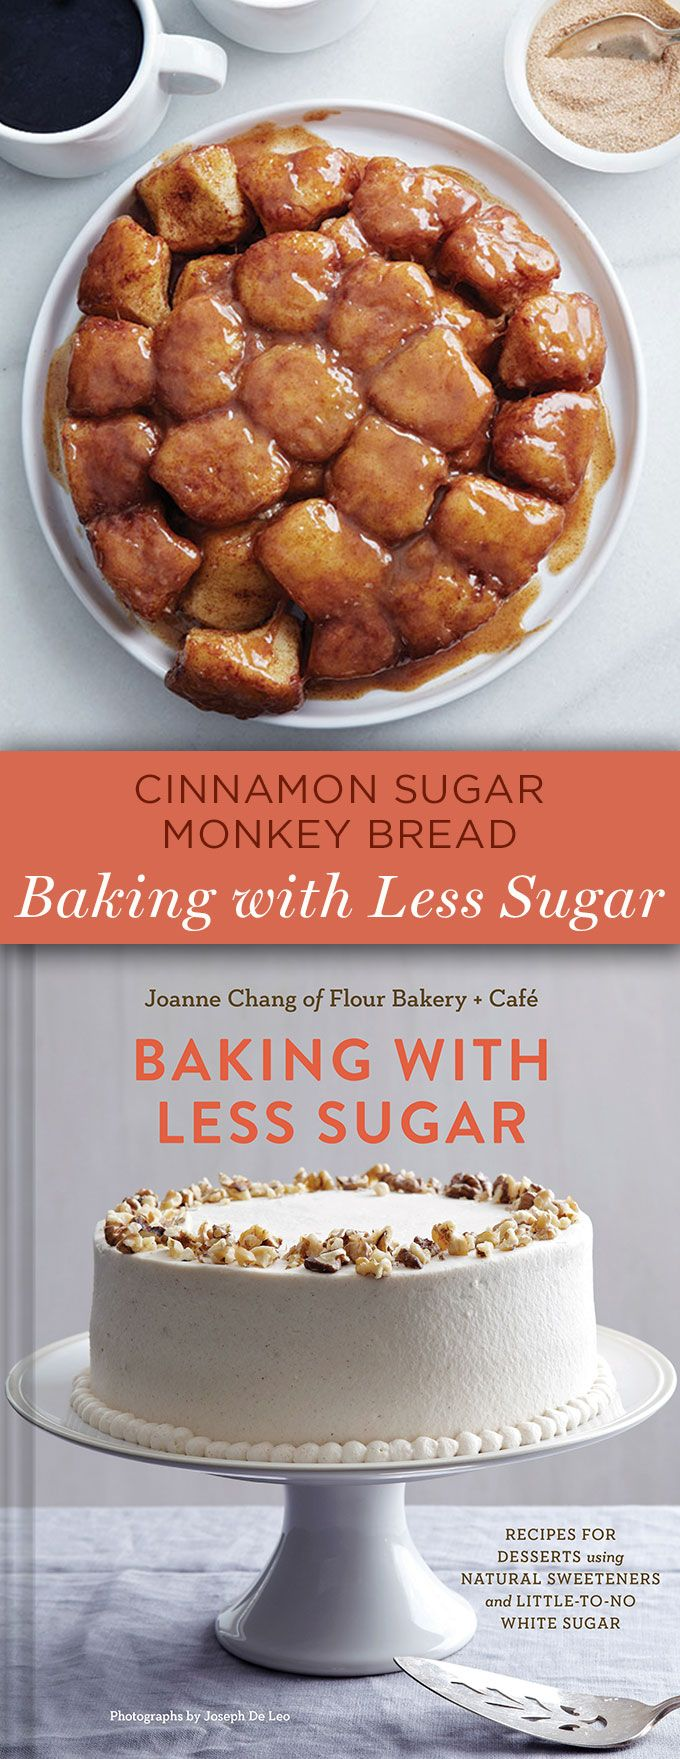 Cinnamon Sugar Monkey Bread- Baking with Less Sugar